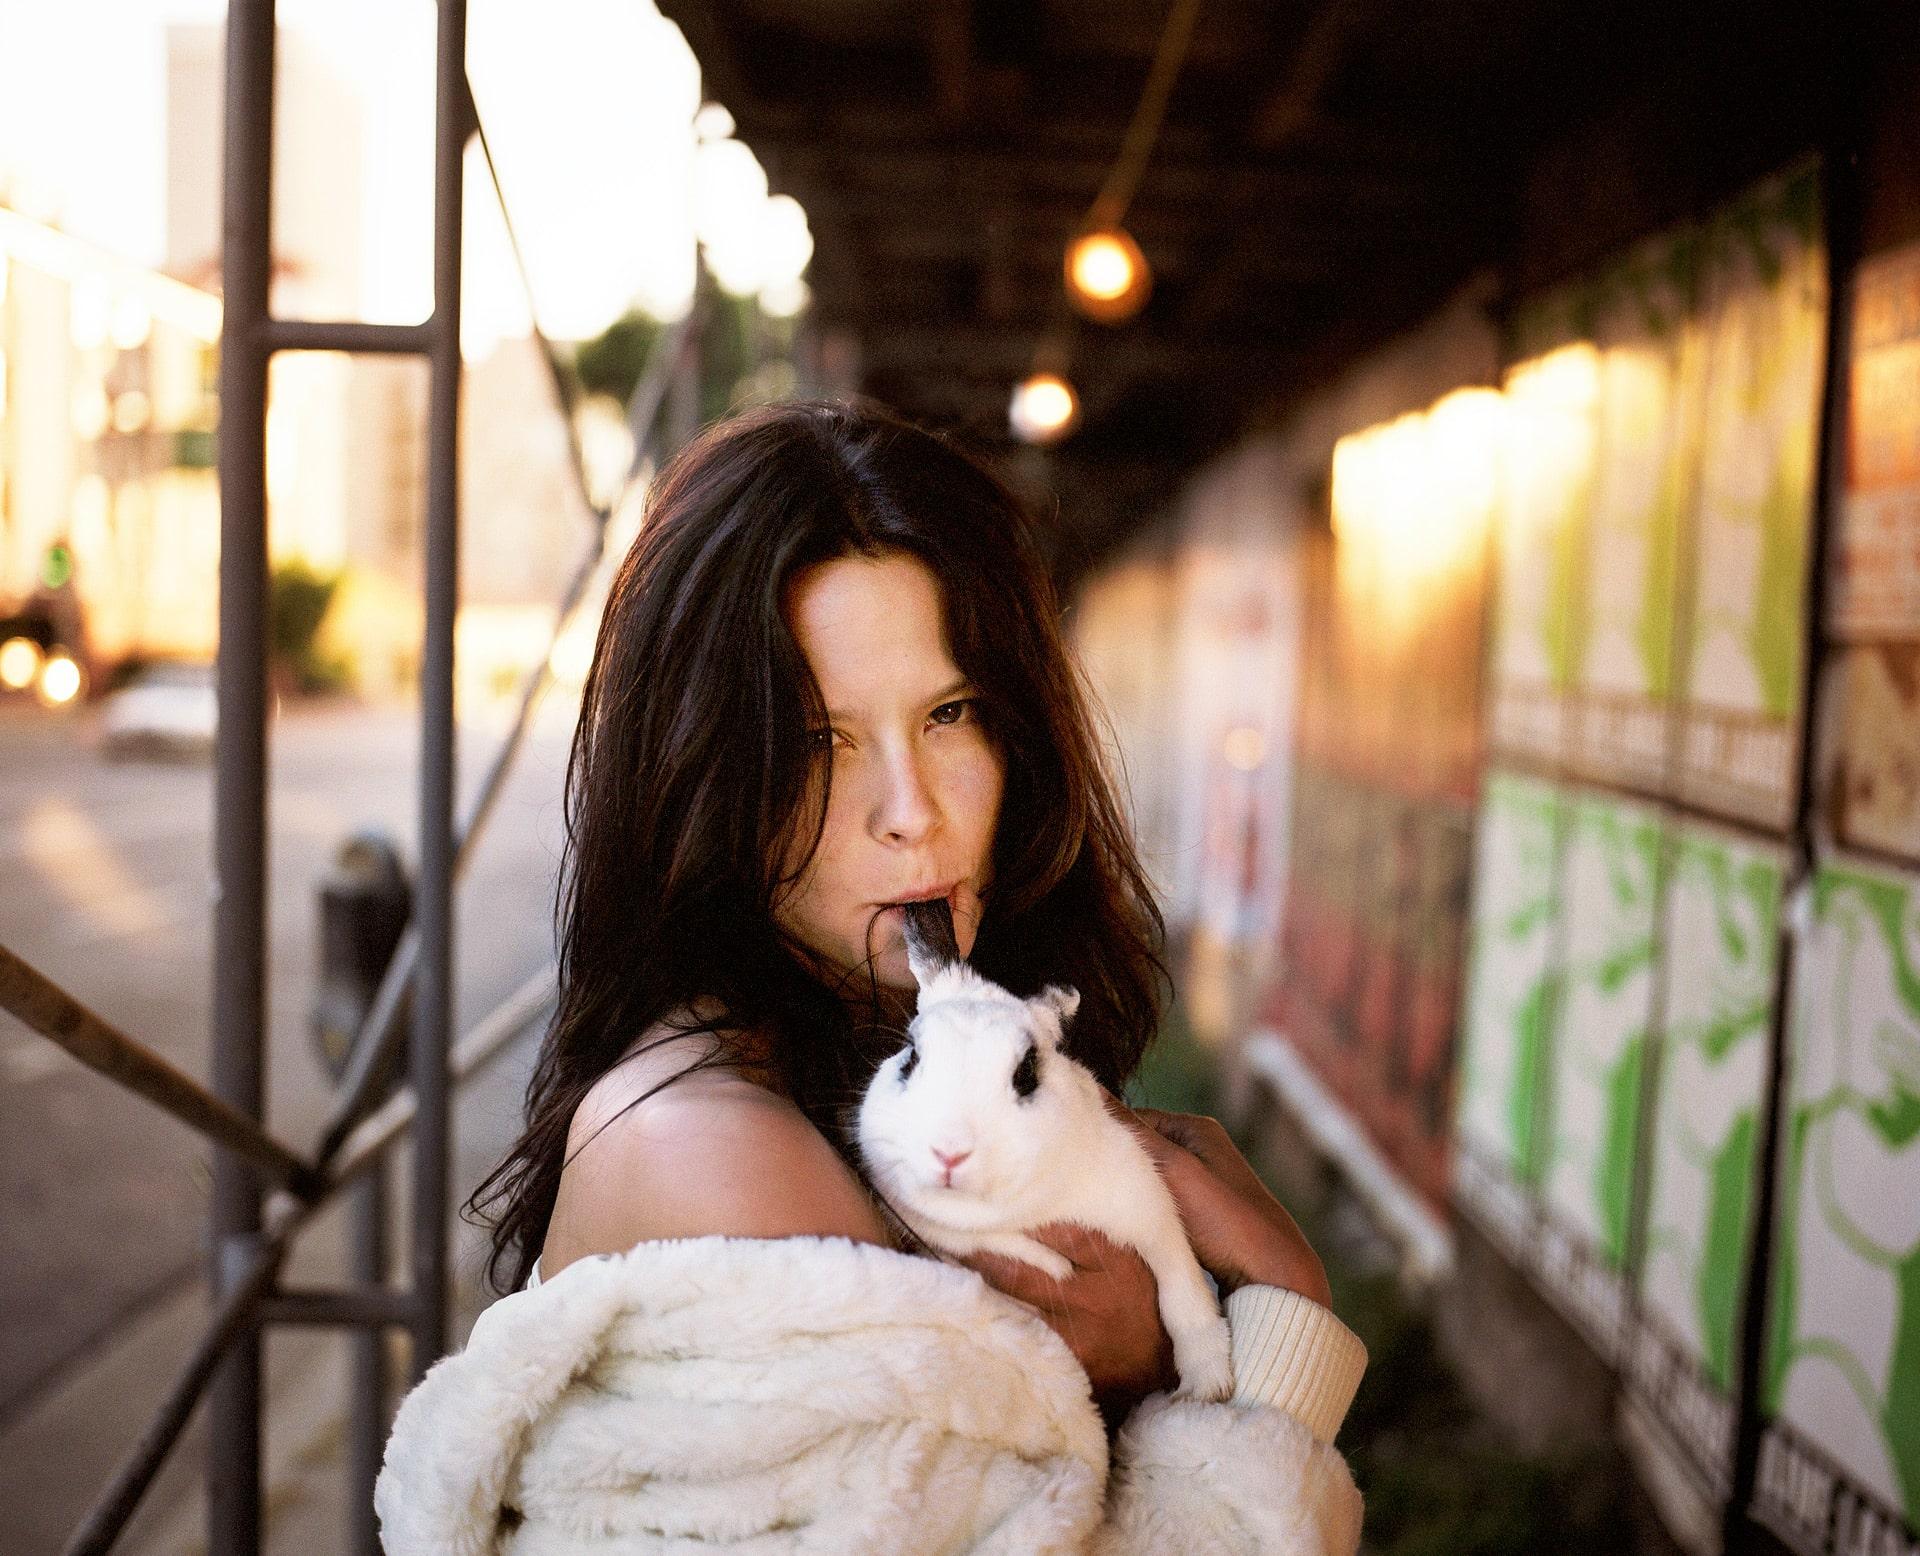 StephanieDiani_Portraiture_003